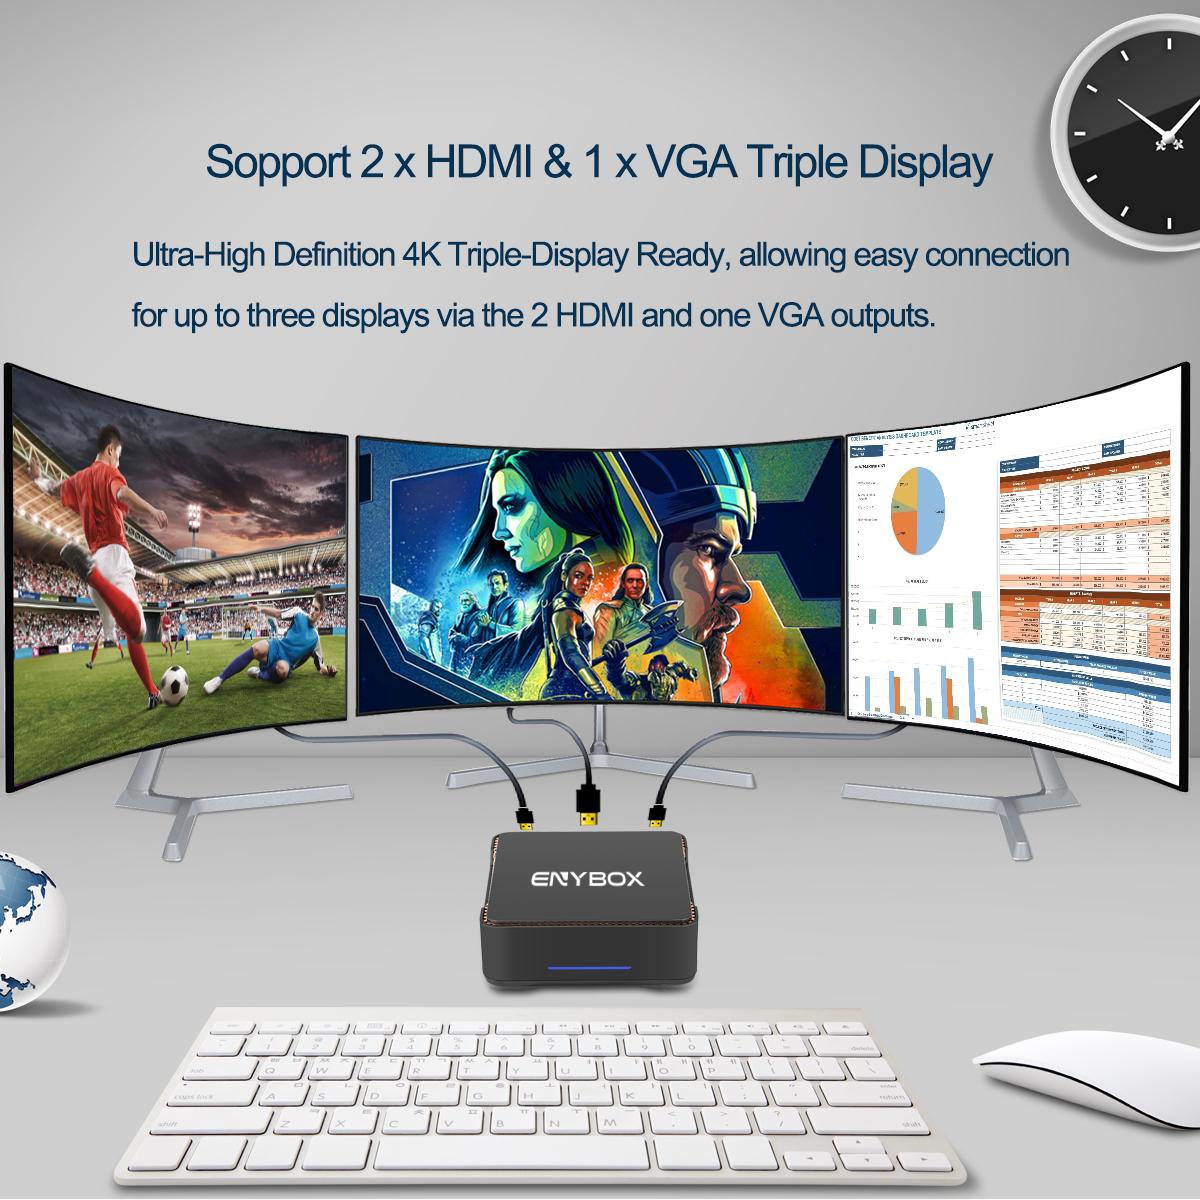 ENYBOX New Released Windows10 Mini PC GK3 Gemini lake J4150 Processor SATAiii 4G RAN 32G ROM 2*HDTV port MINI PC